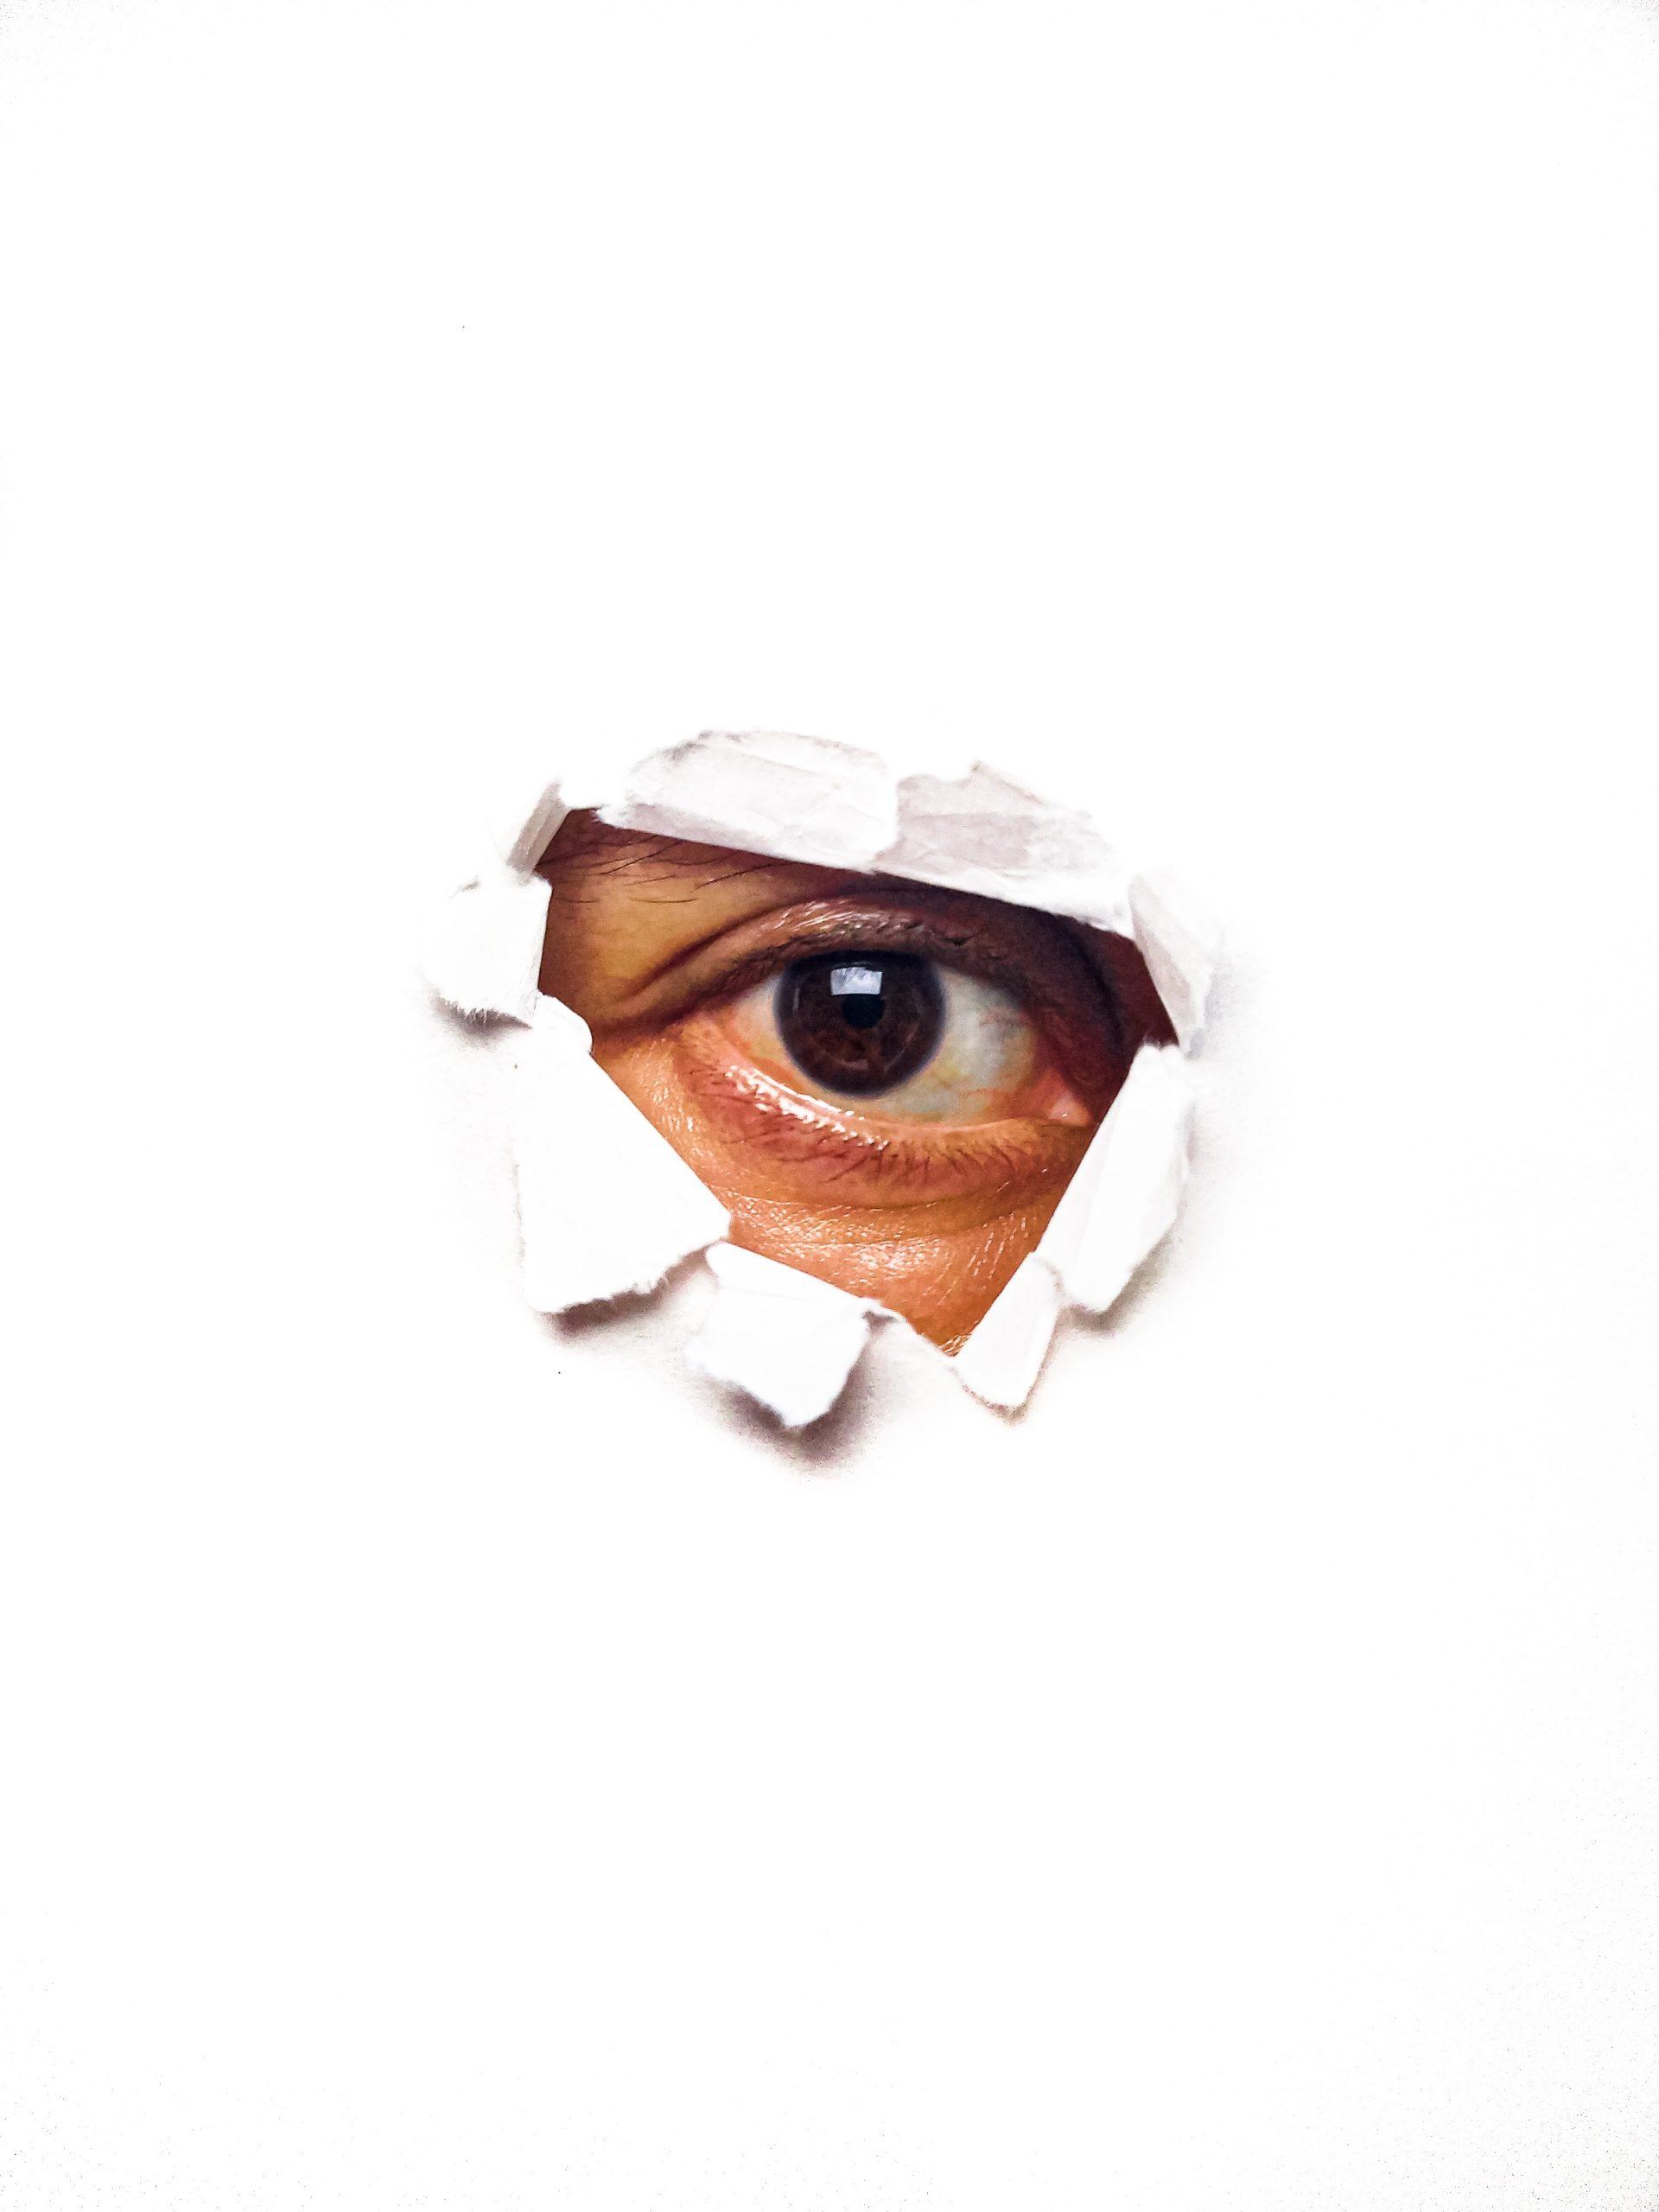 Eye on White Background